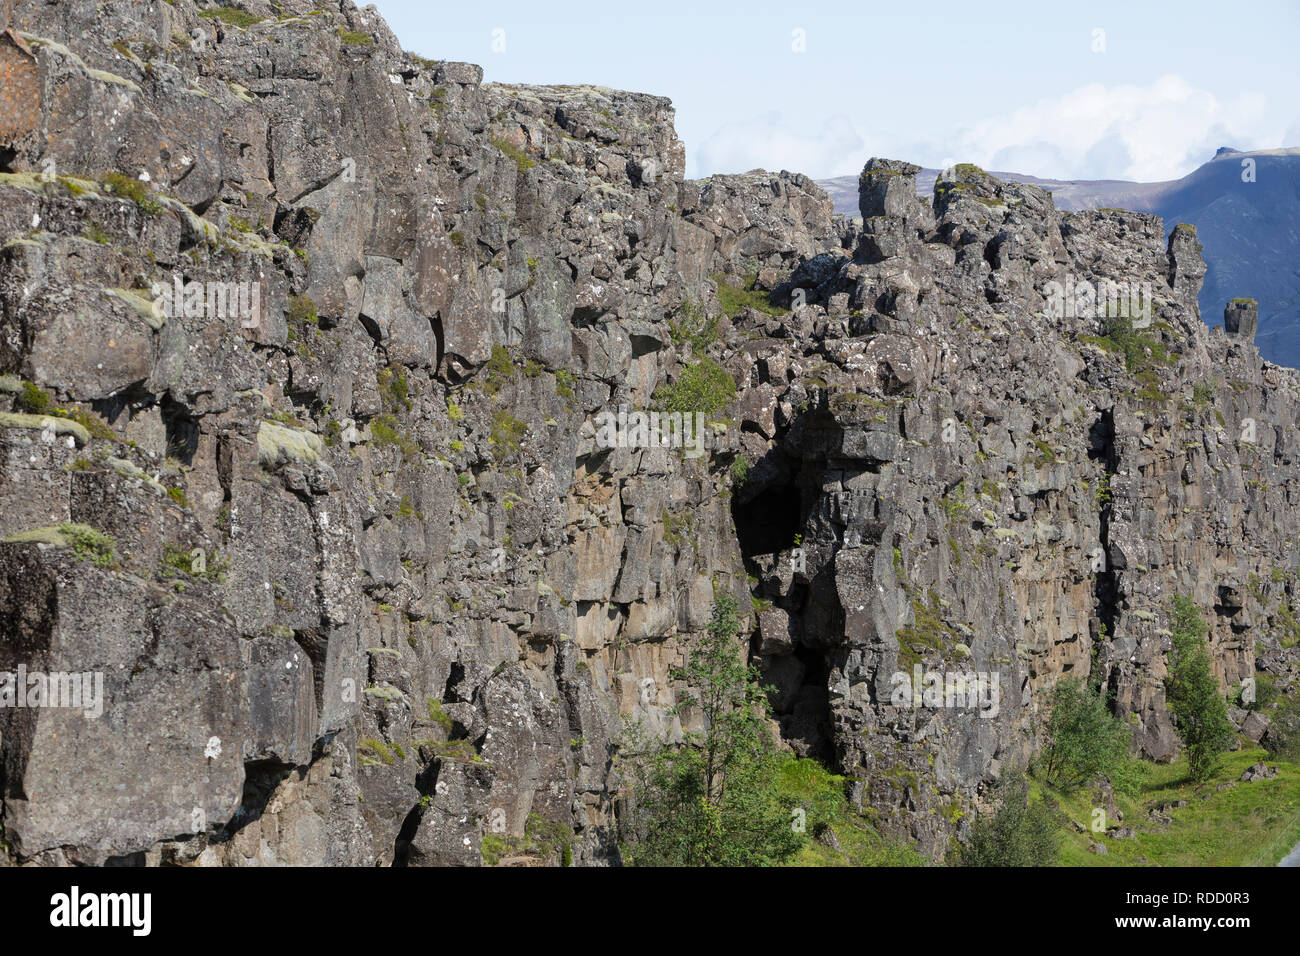 Almannagjá, Almannagja, Allmännerschlucht, Allmänner-Schlucht, Schlucht im Nationalpark Þingvellir, Þingvellir, Pingvellir, Thingvellir, Þingvellir-Na - Stock Image